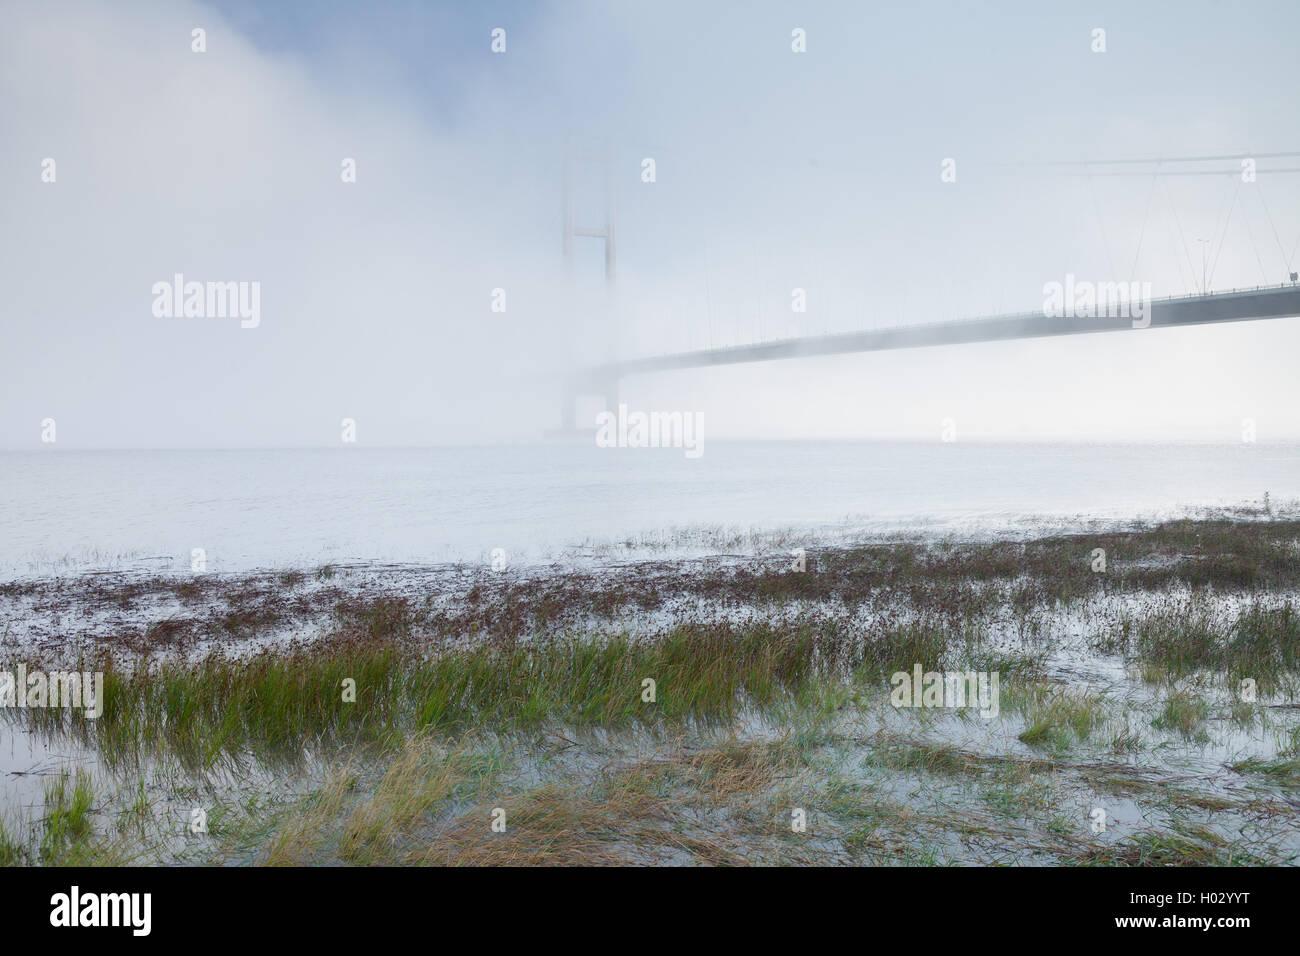 Die Humber-Brücke im Nebel und Nebel. Die Brücke verbindet Hessle in East Yorkshire Barton-upon-Humber Stockbild